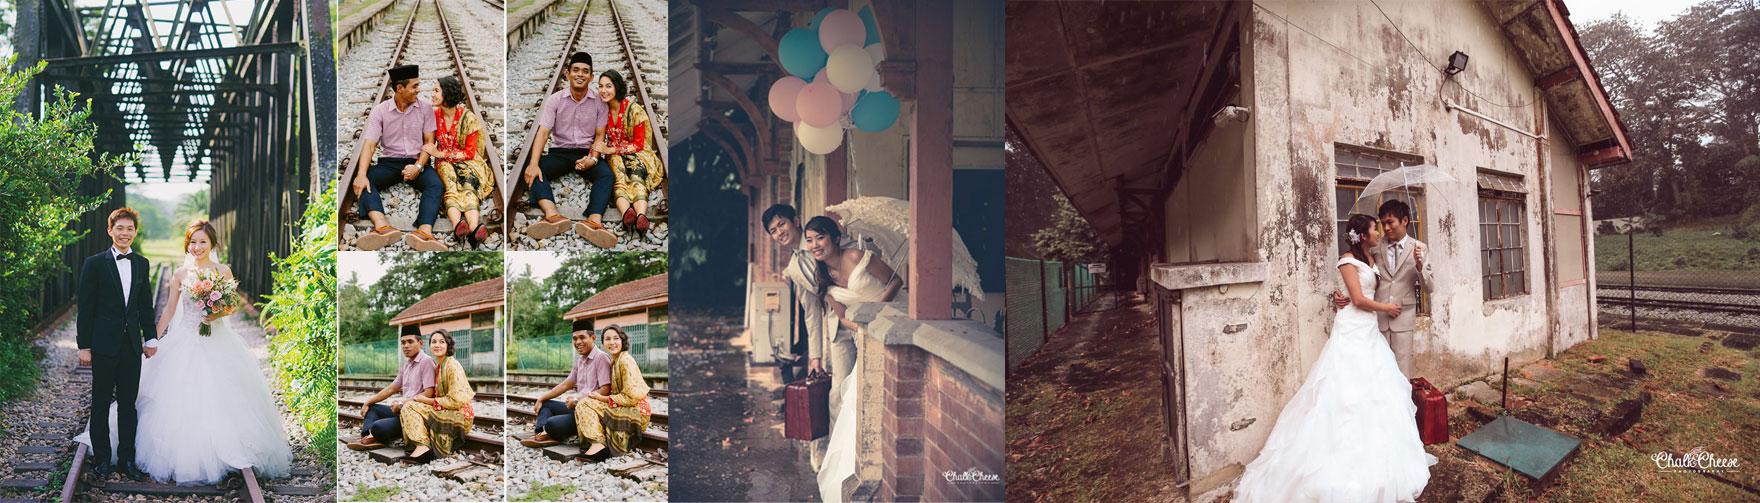 Bukit-Timah-Railway-Tracks-wedding